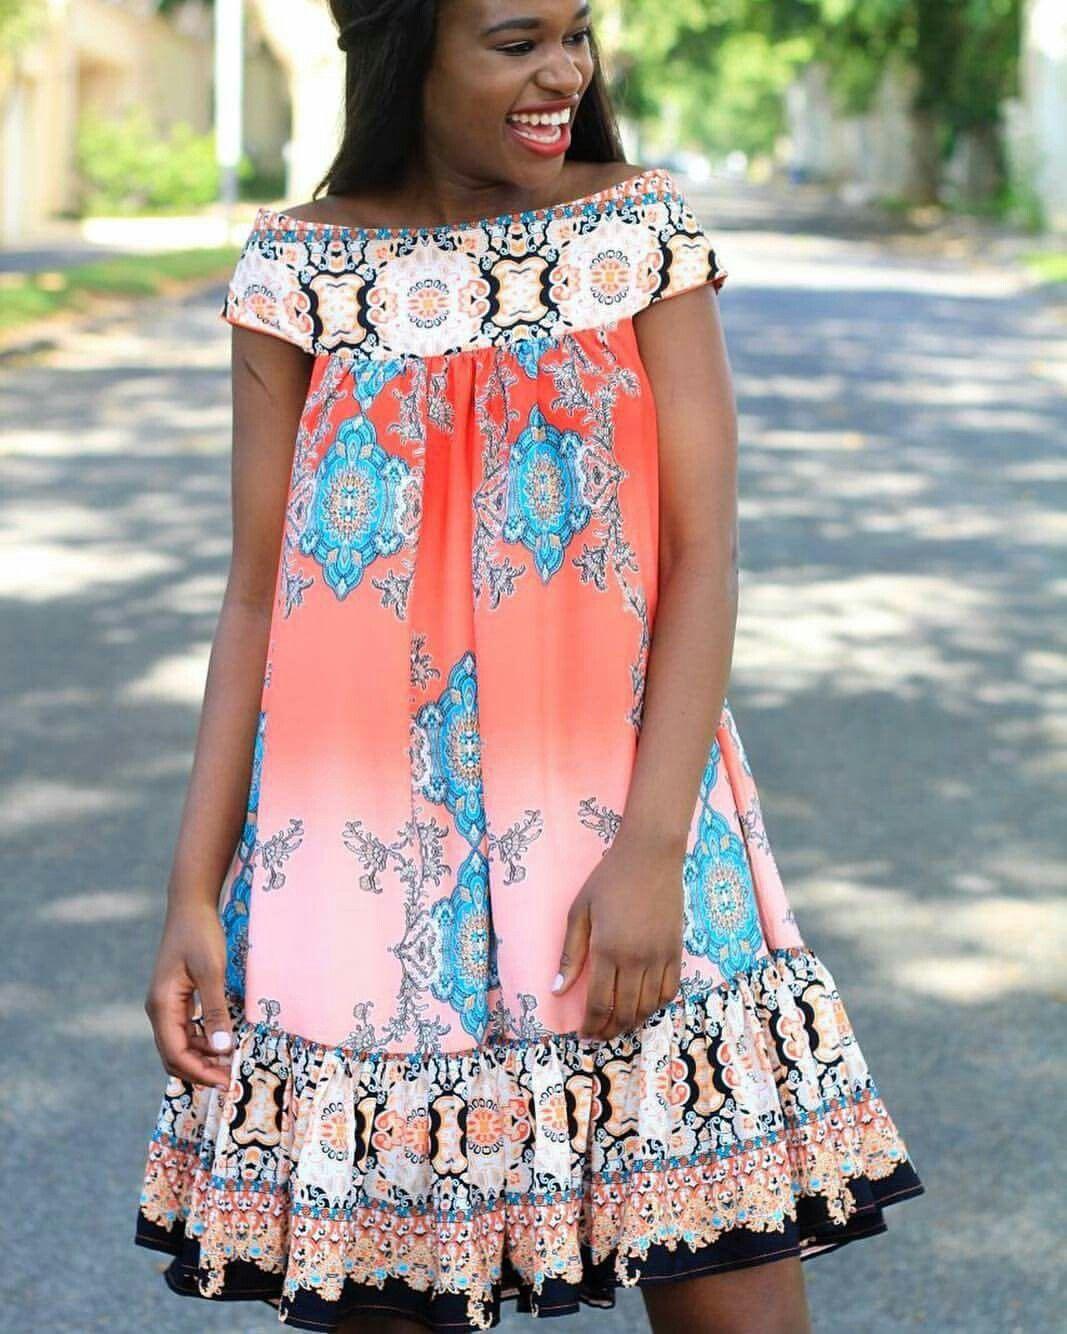 robe wax pour femme enceinte robes tendance pour femme robe tendance pagne africain robe. Black Bedroom Furniture Sets. Home Design Ideas